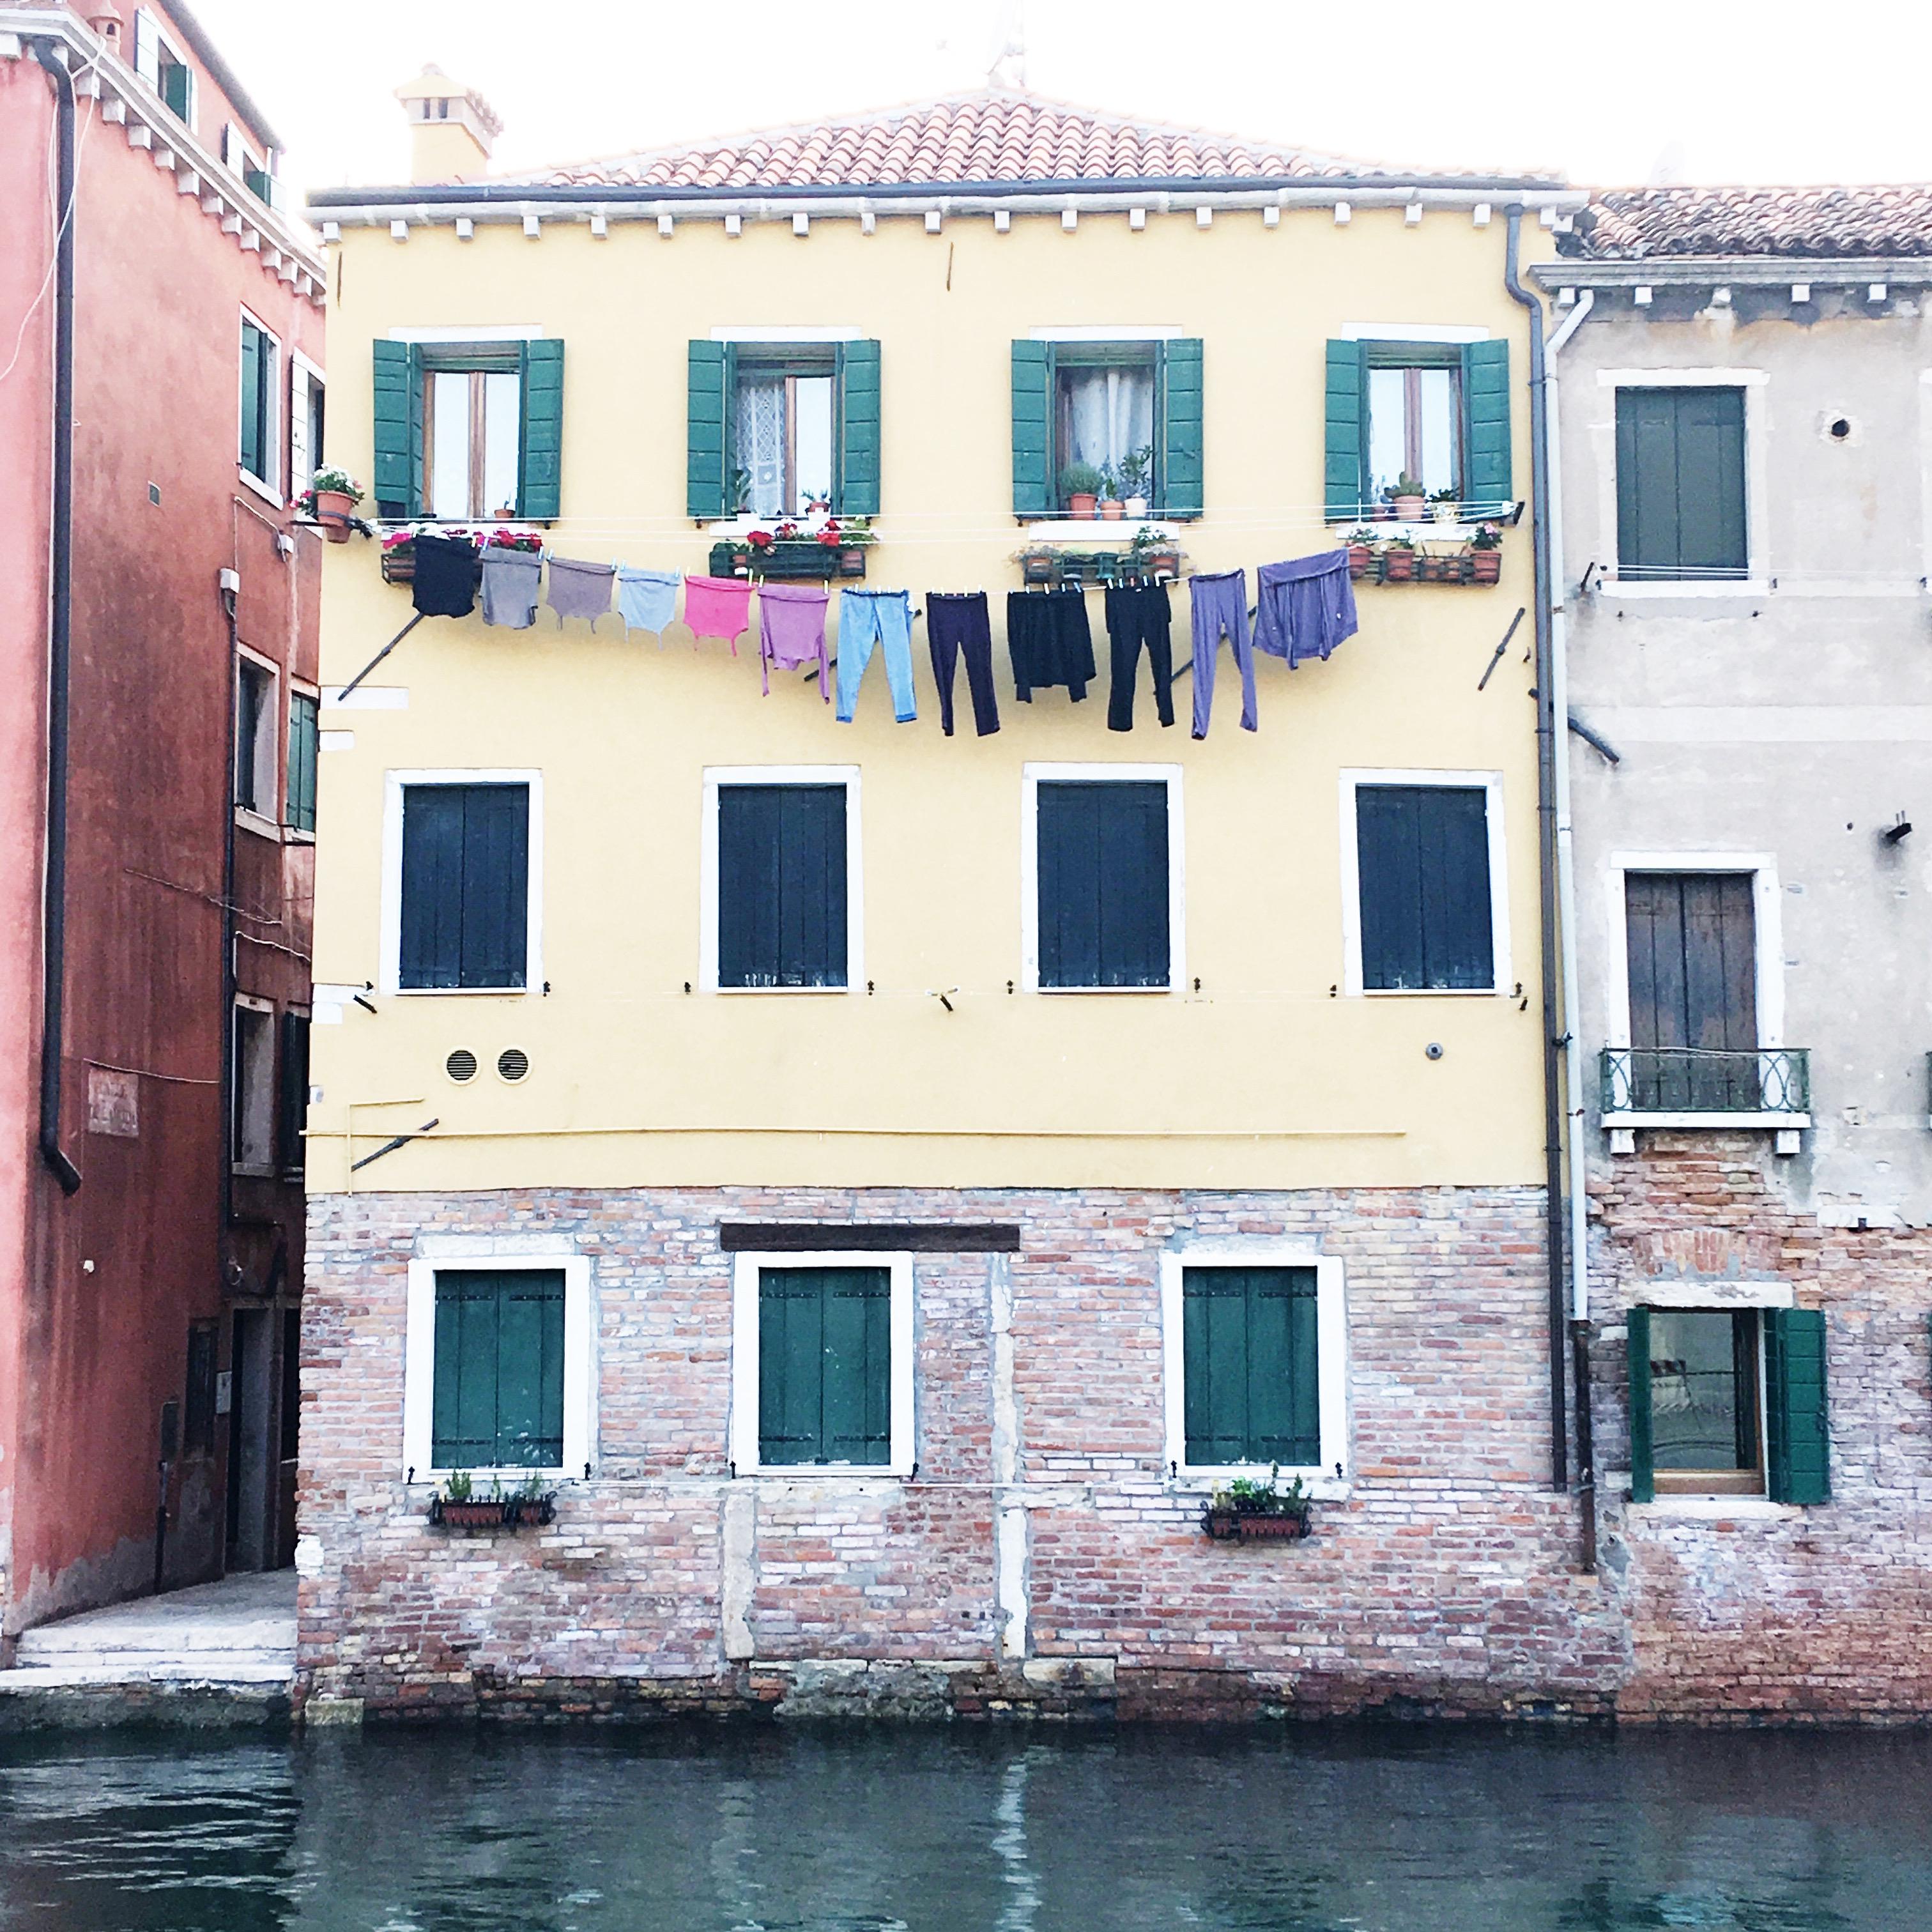 venezia, panni stesi - Vivere per Raccontarla